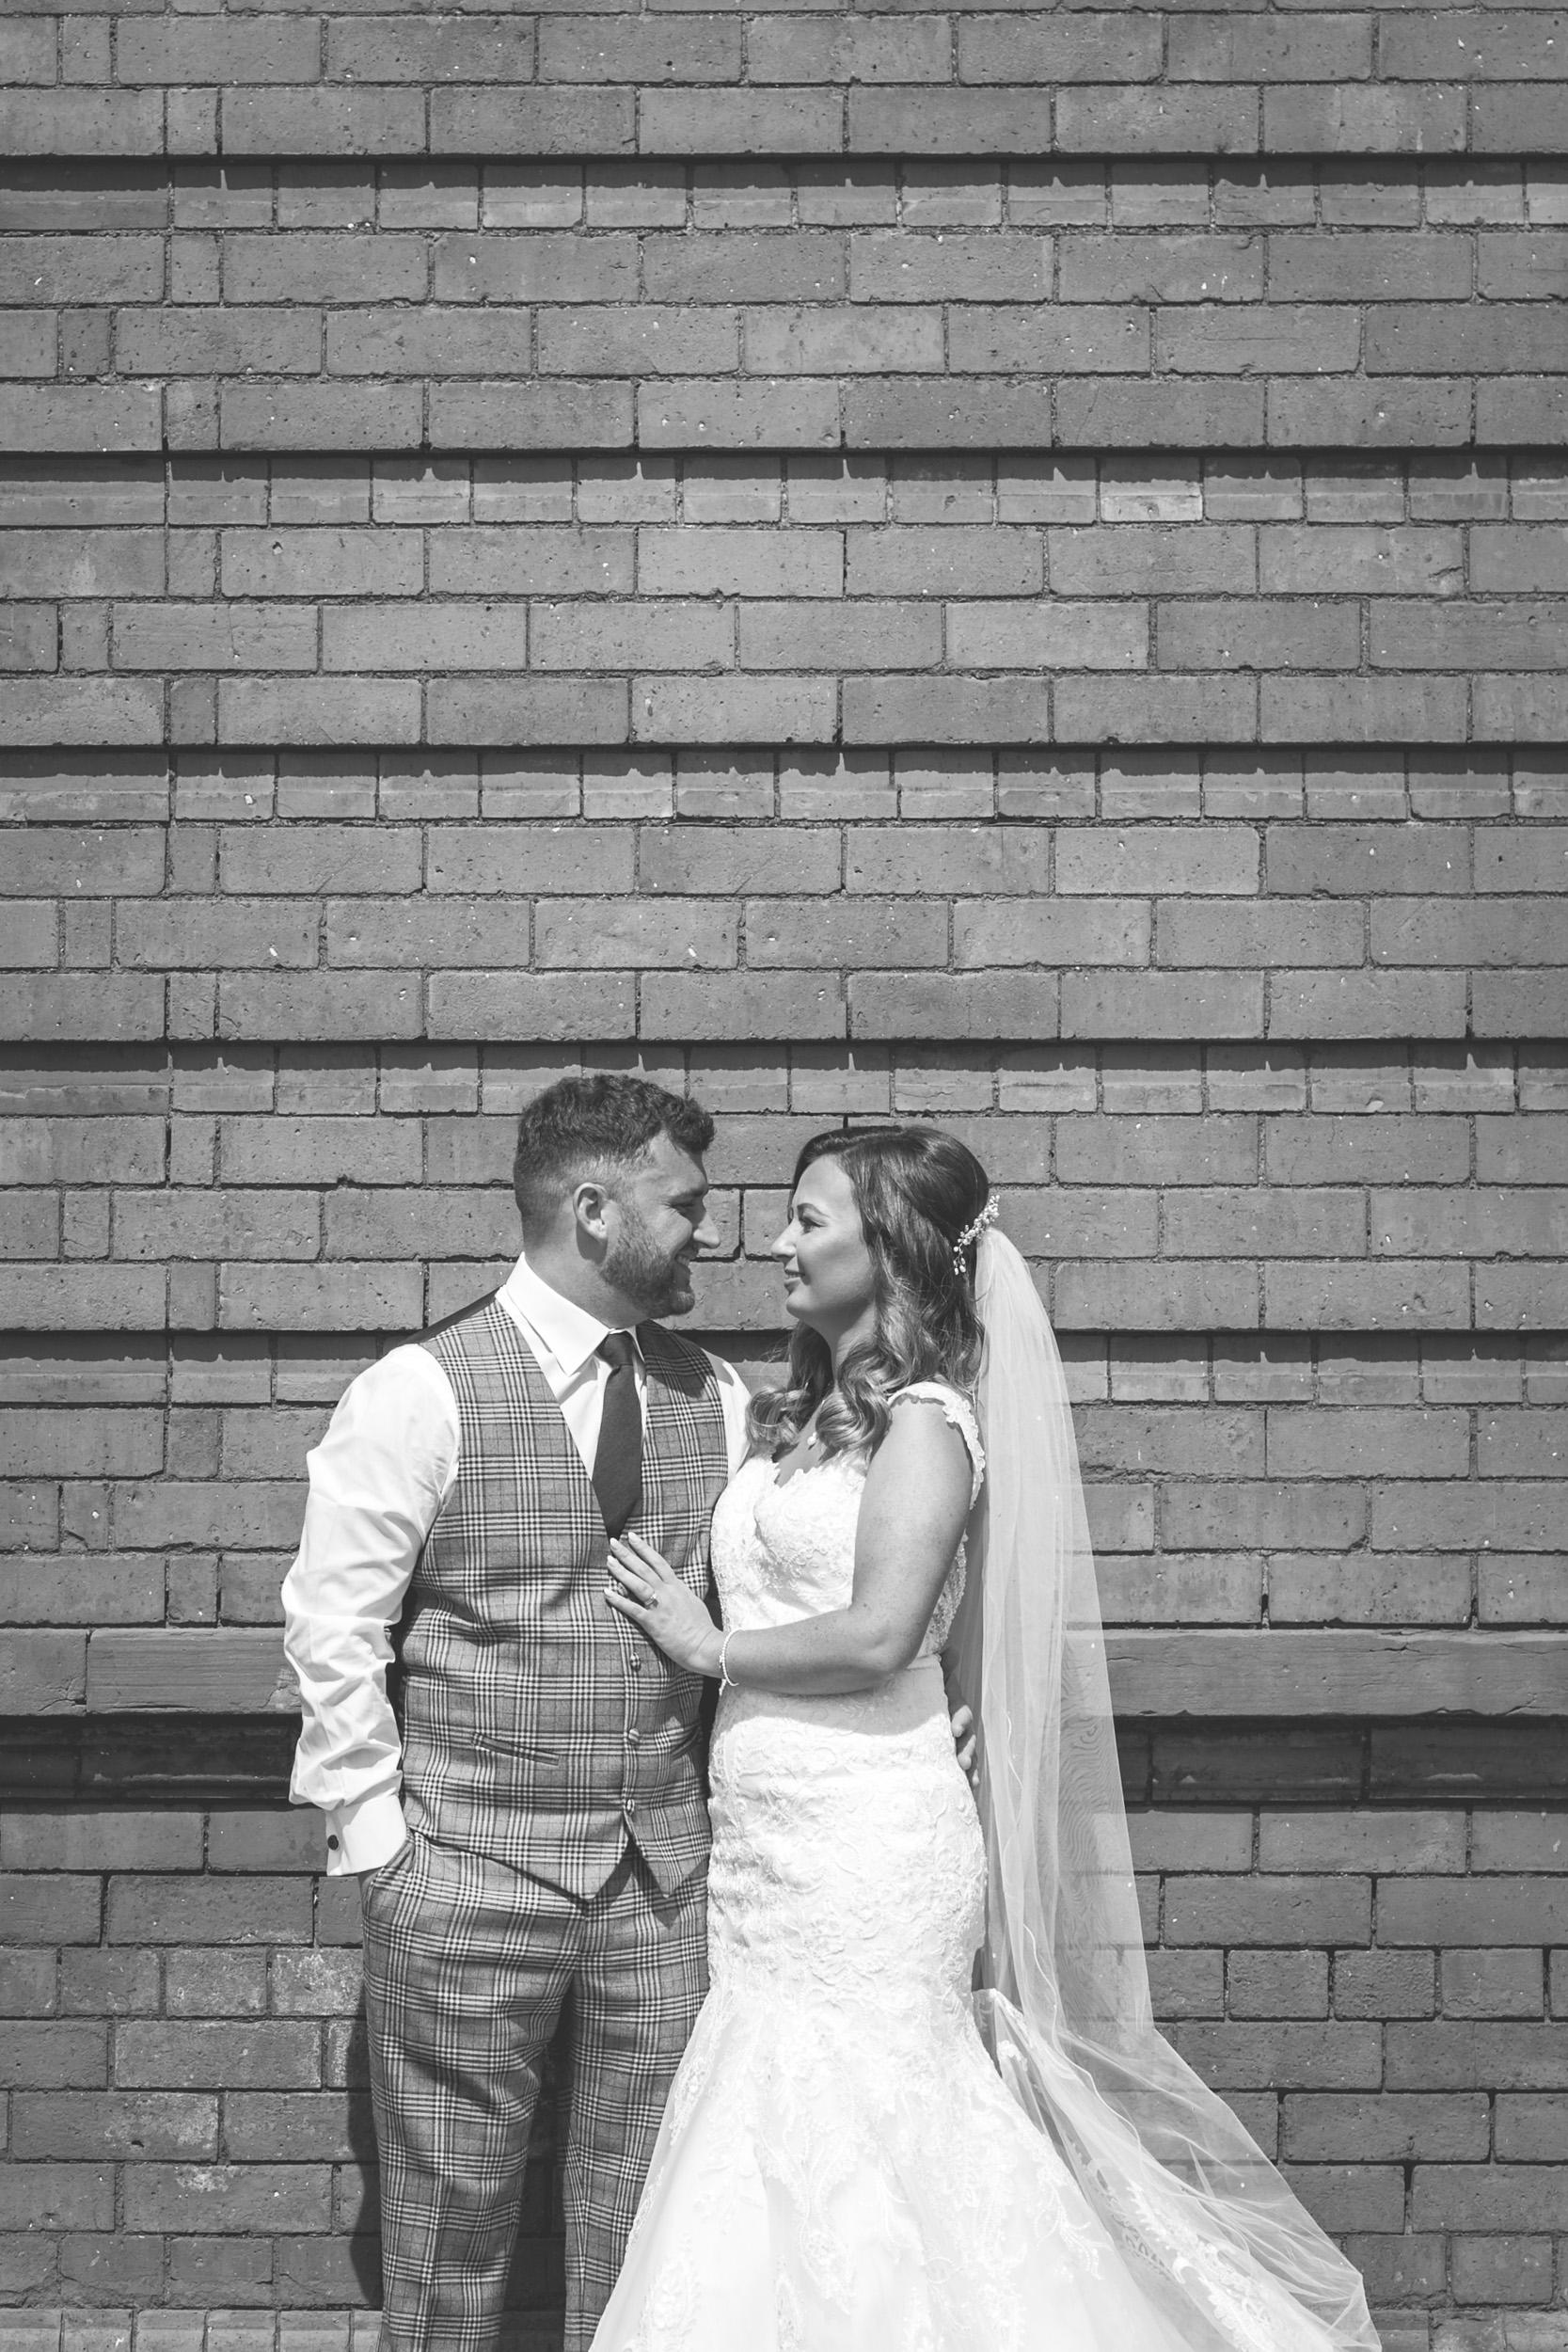 Brian McEwan   Northern Ireland Wedding Photographer   Rebecca & Michael   Portraits-85.jpg